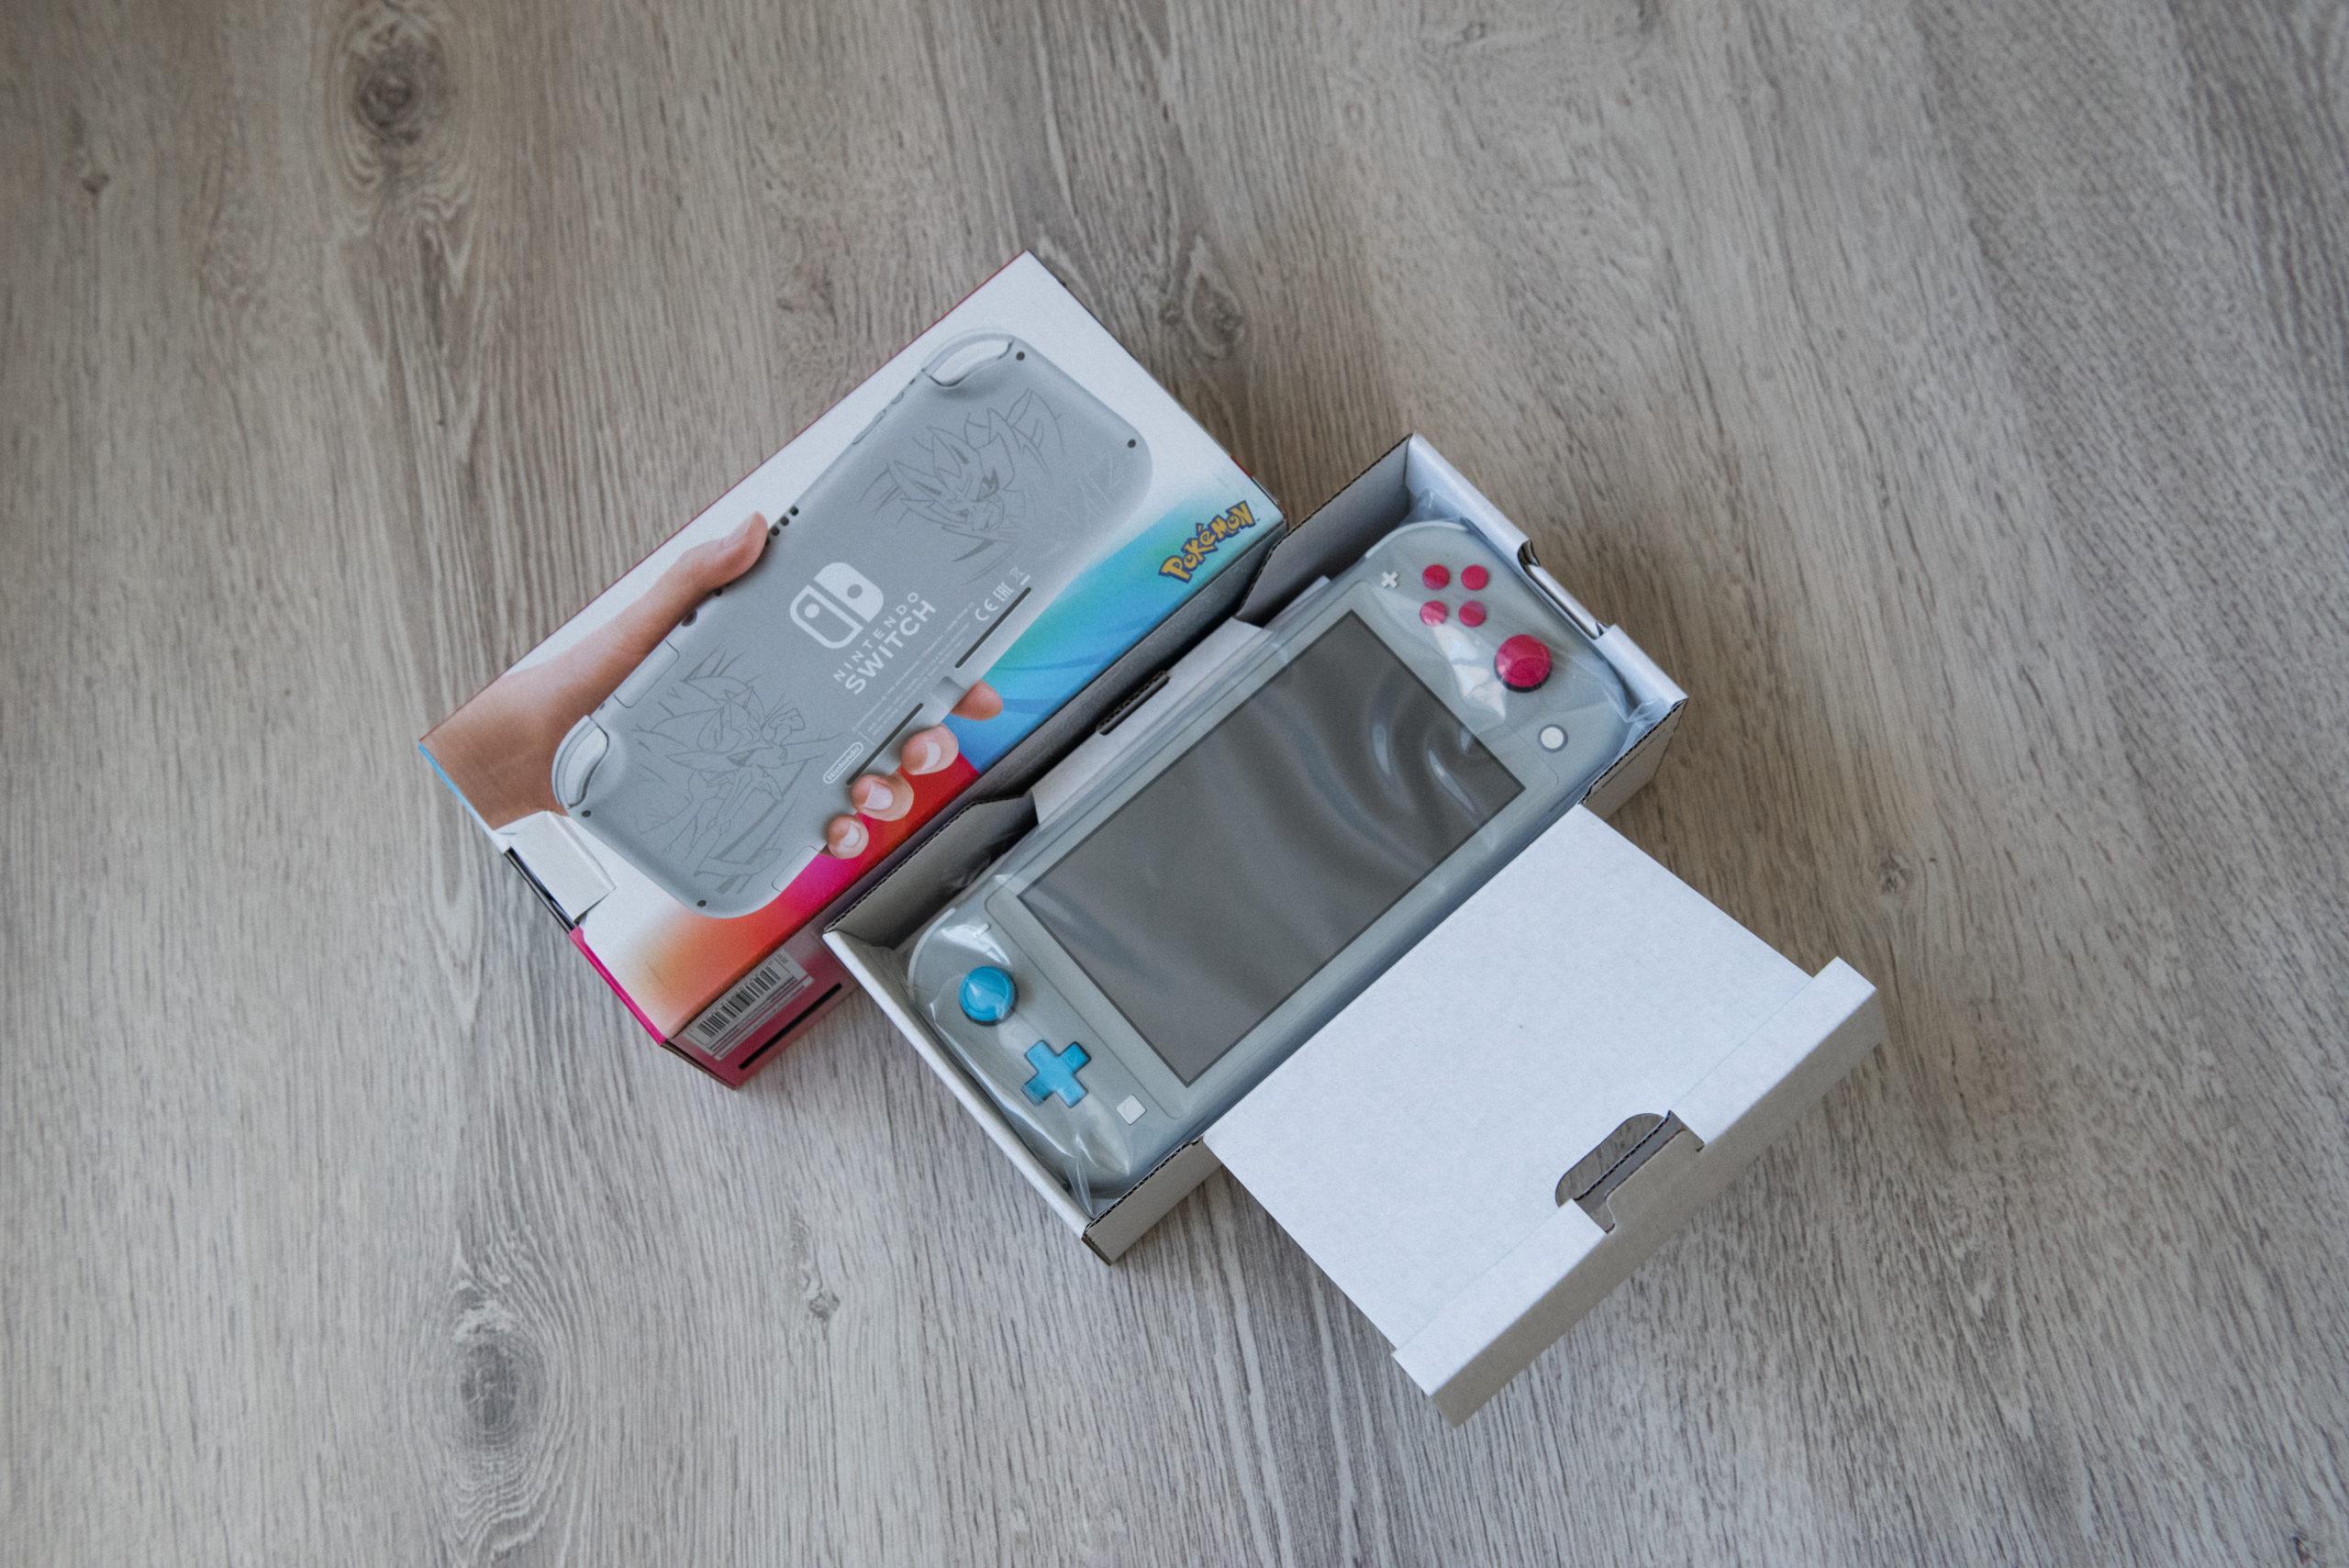 Обзор Nintendo Switch Lite - Жизнь после гибрида 3